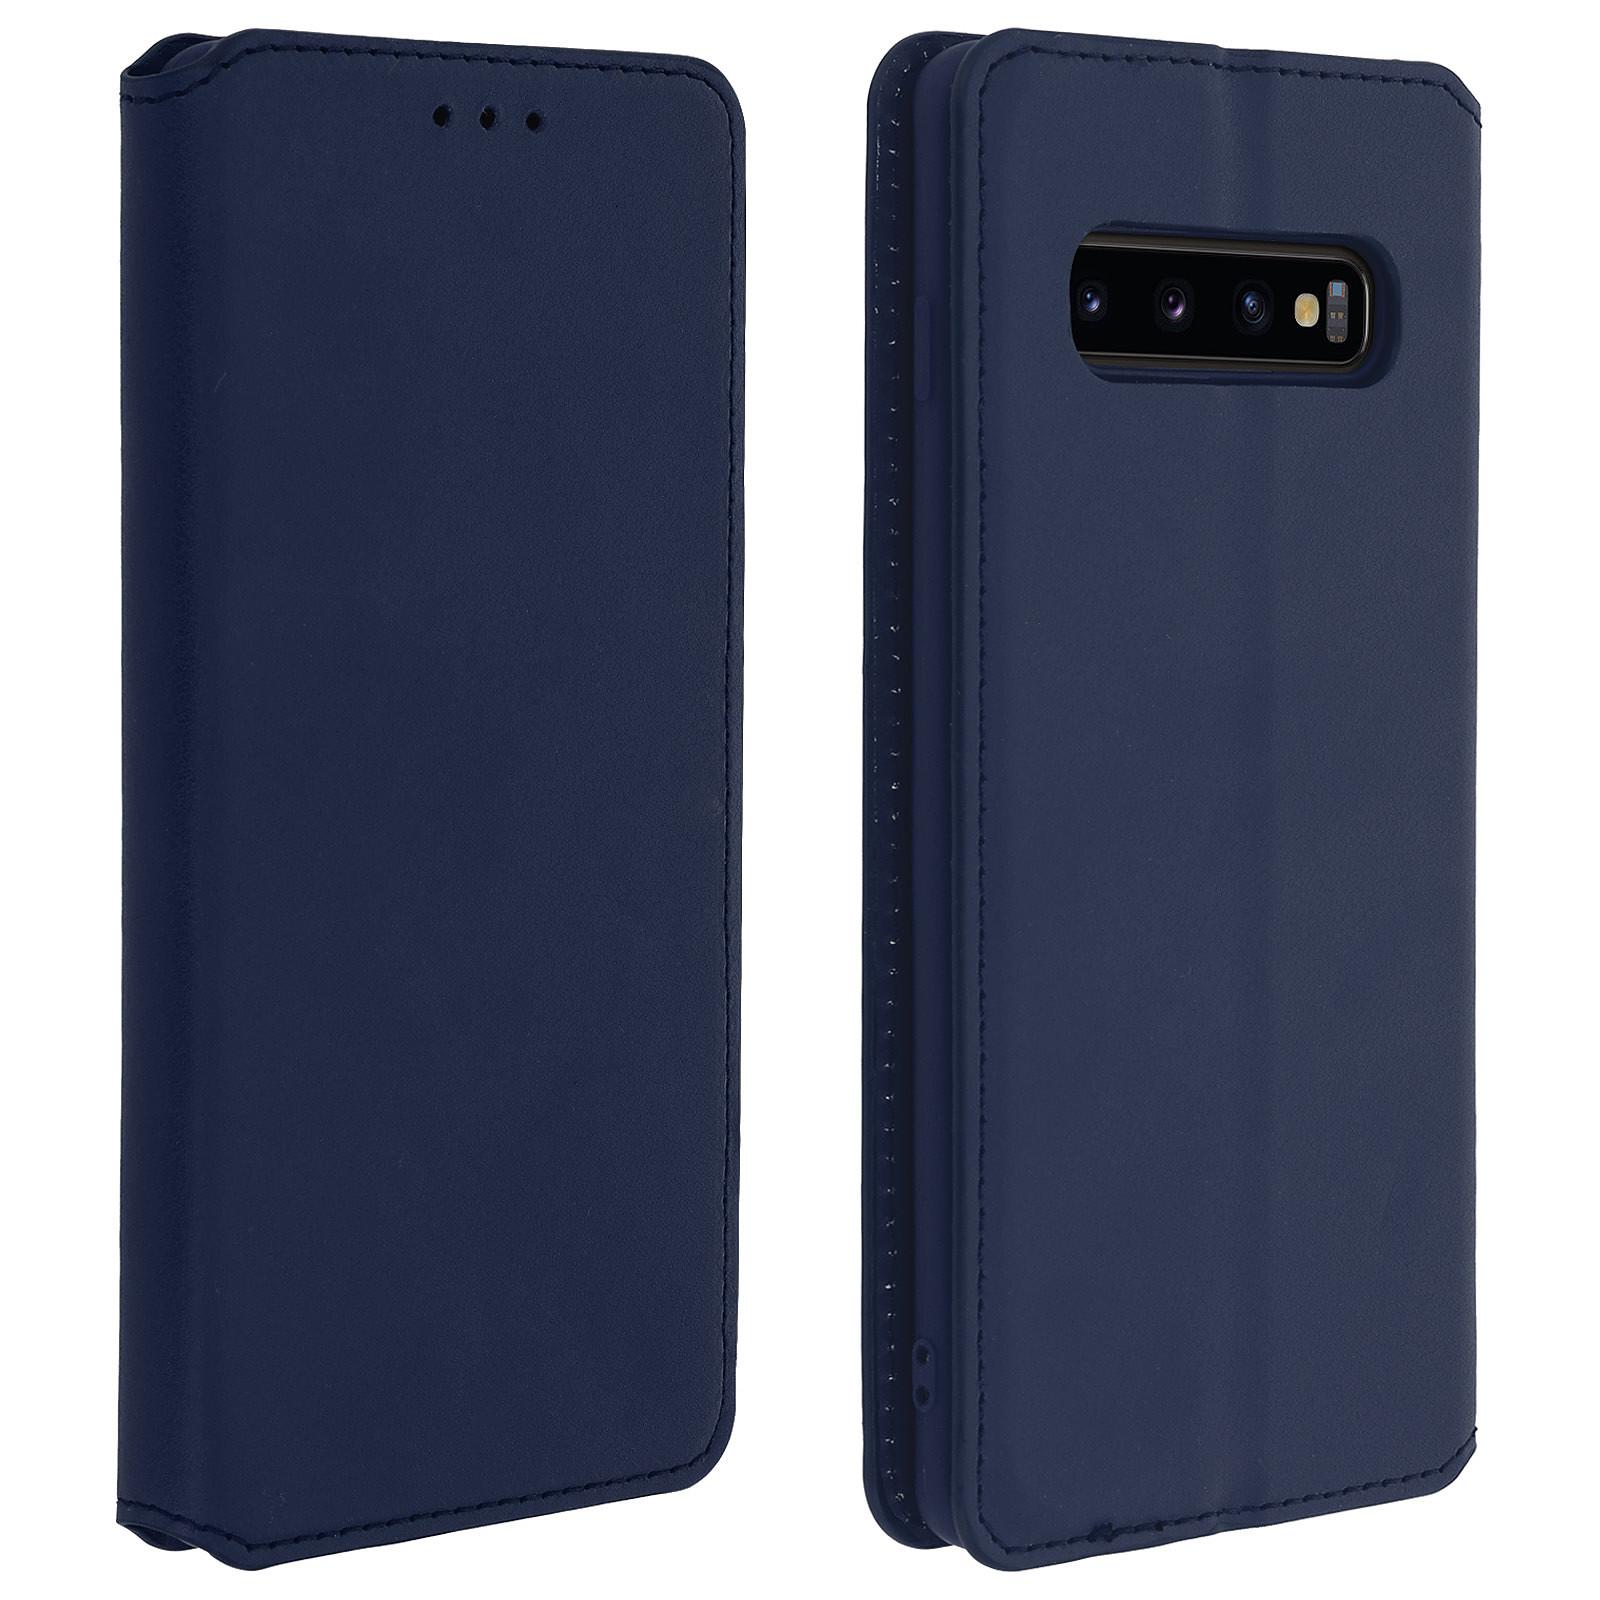 Avizar Etui folio Bleu Nuit pour Samsung Galaxy S10